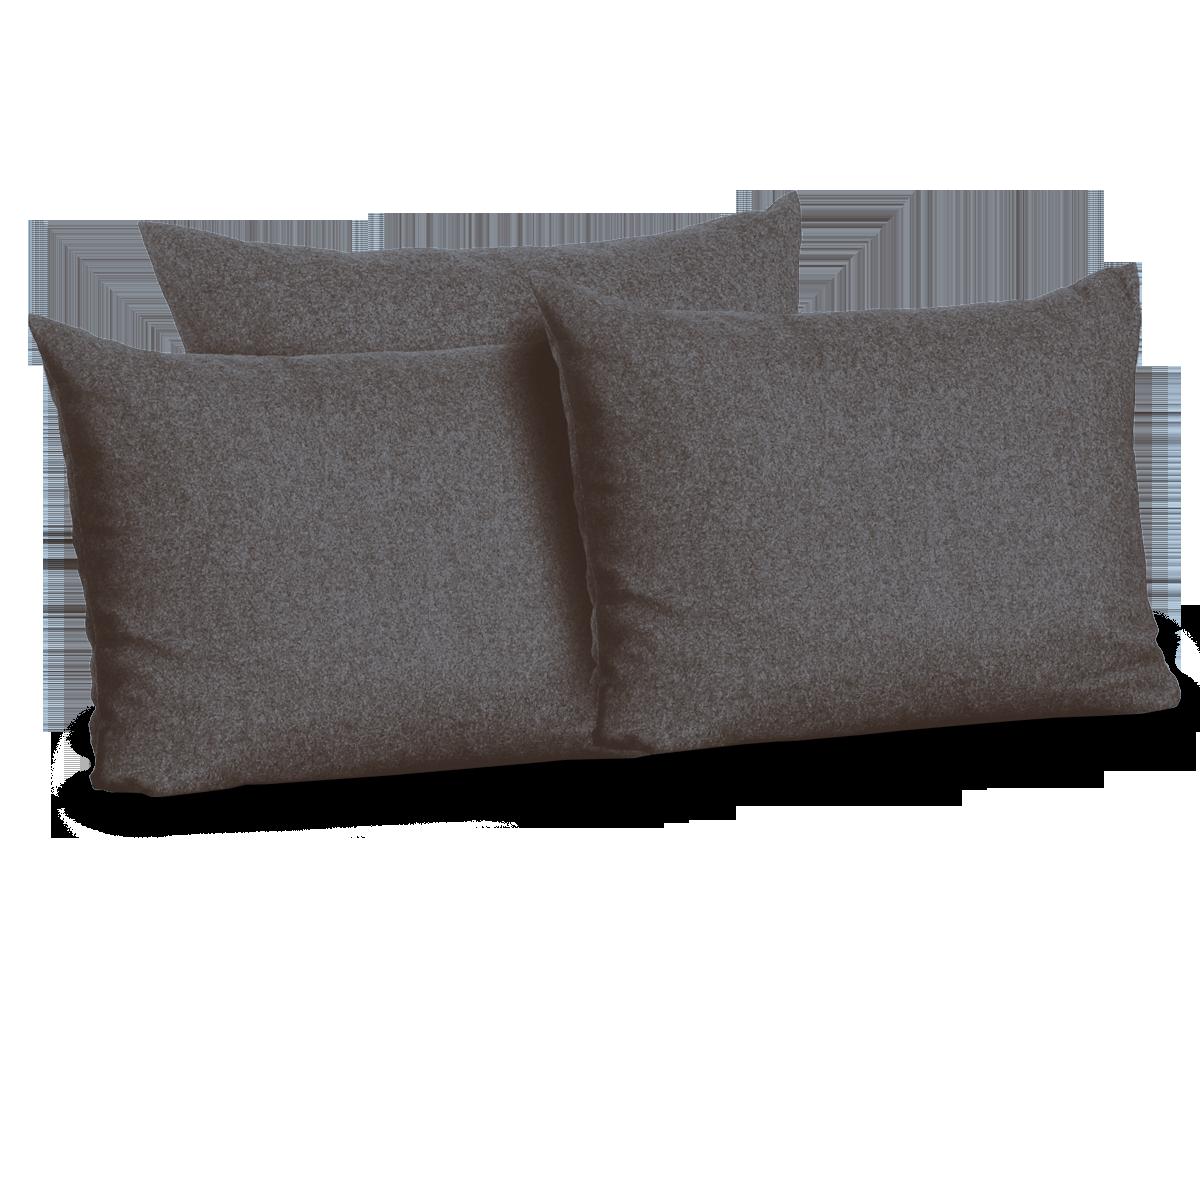 kissenset f r bettsofa stefano gr ne erde. Black Bedroom Furniture Sets. Home Design Ideas